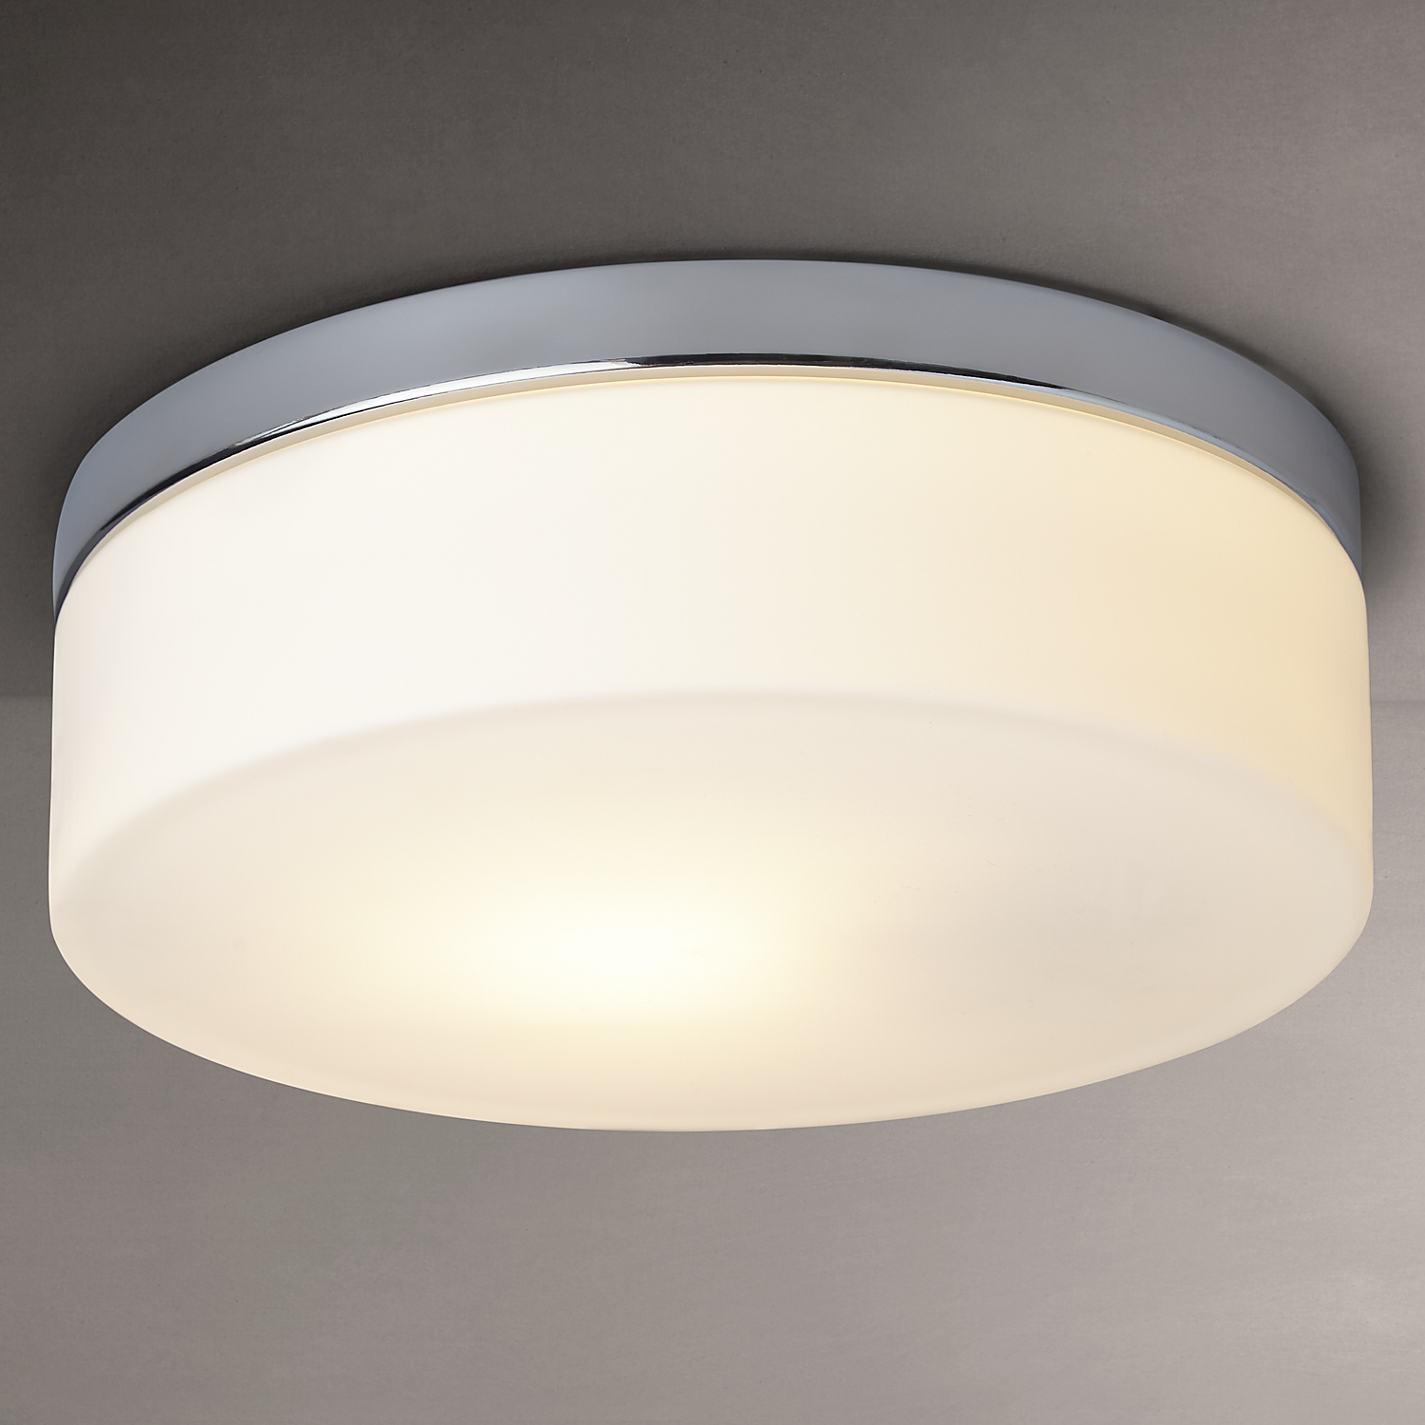 Ceiling Lights For Bathroom Top Astro Sabina Round Flush Light Plan